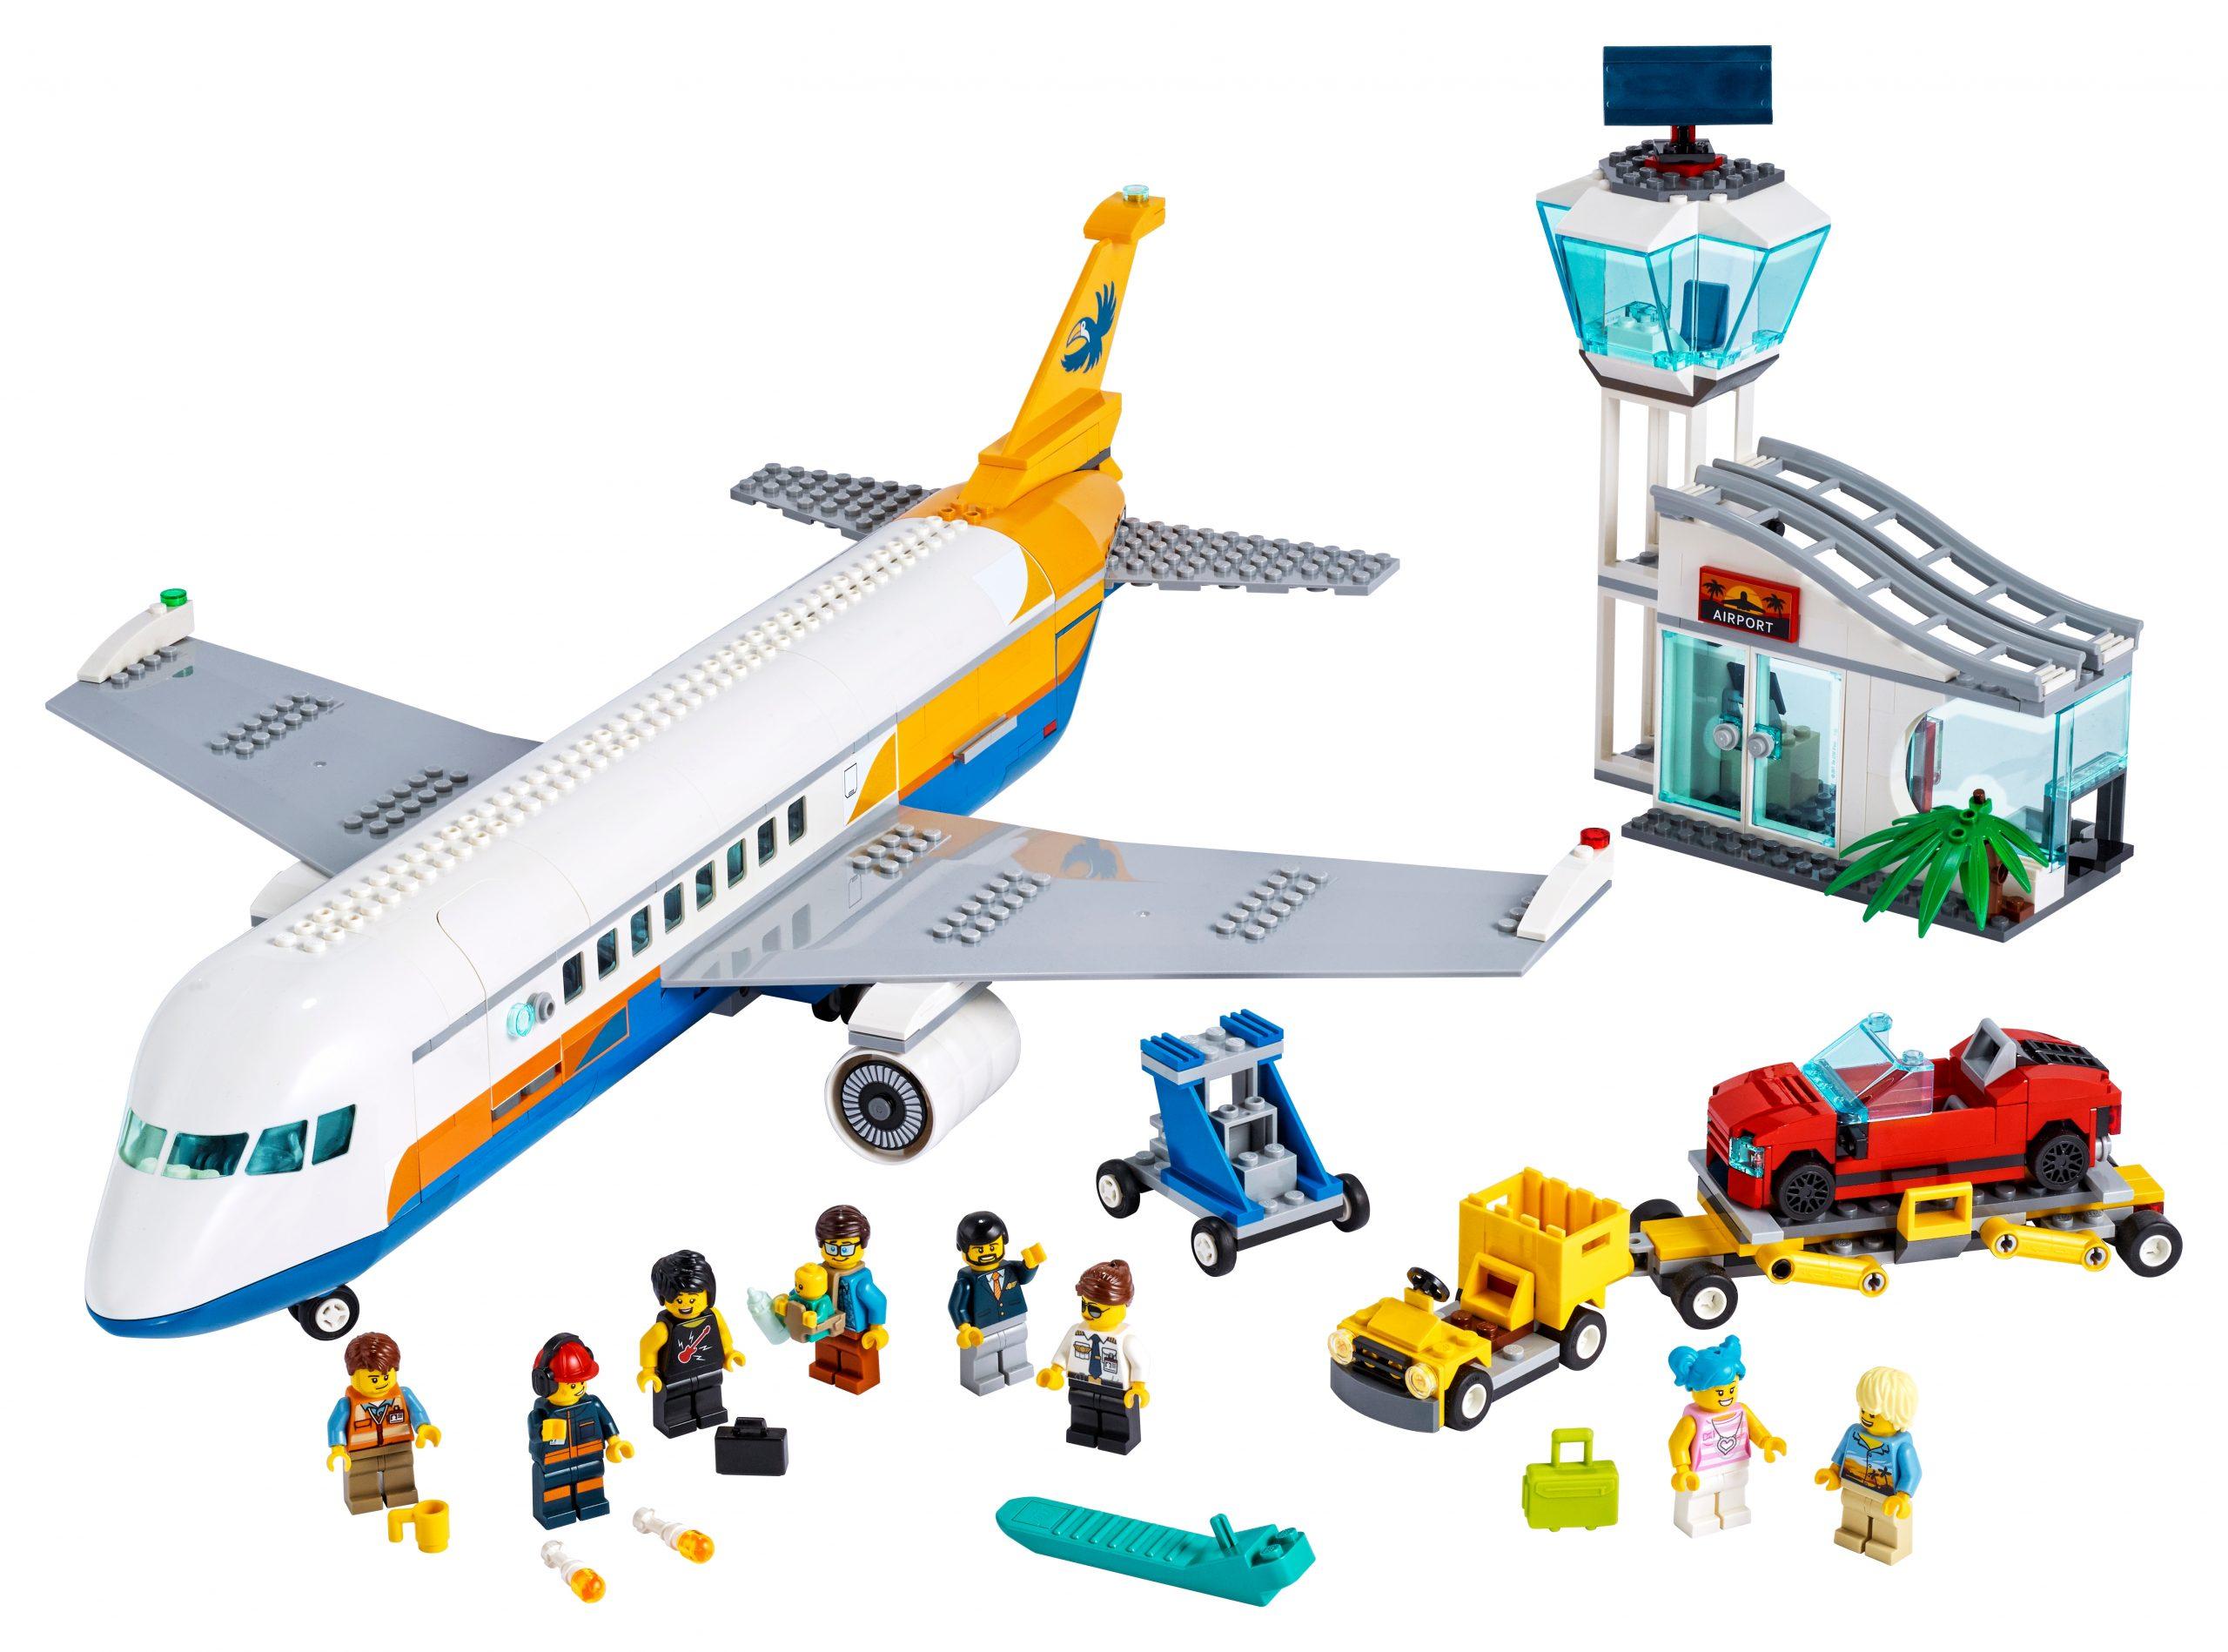 lego passagiersvliegtuig 60262 scaled